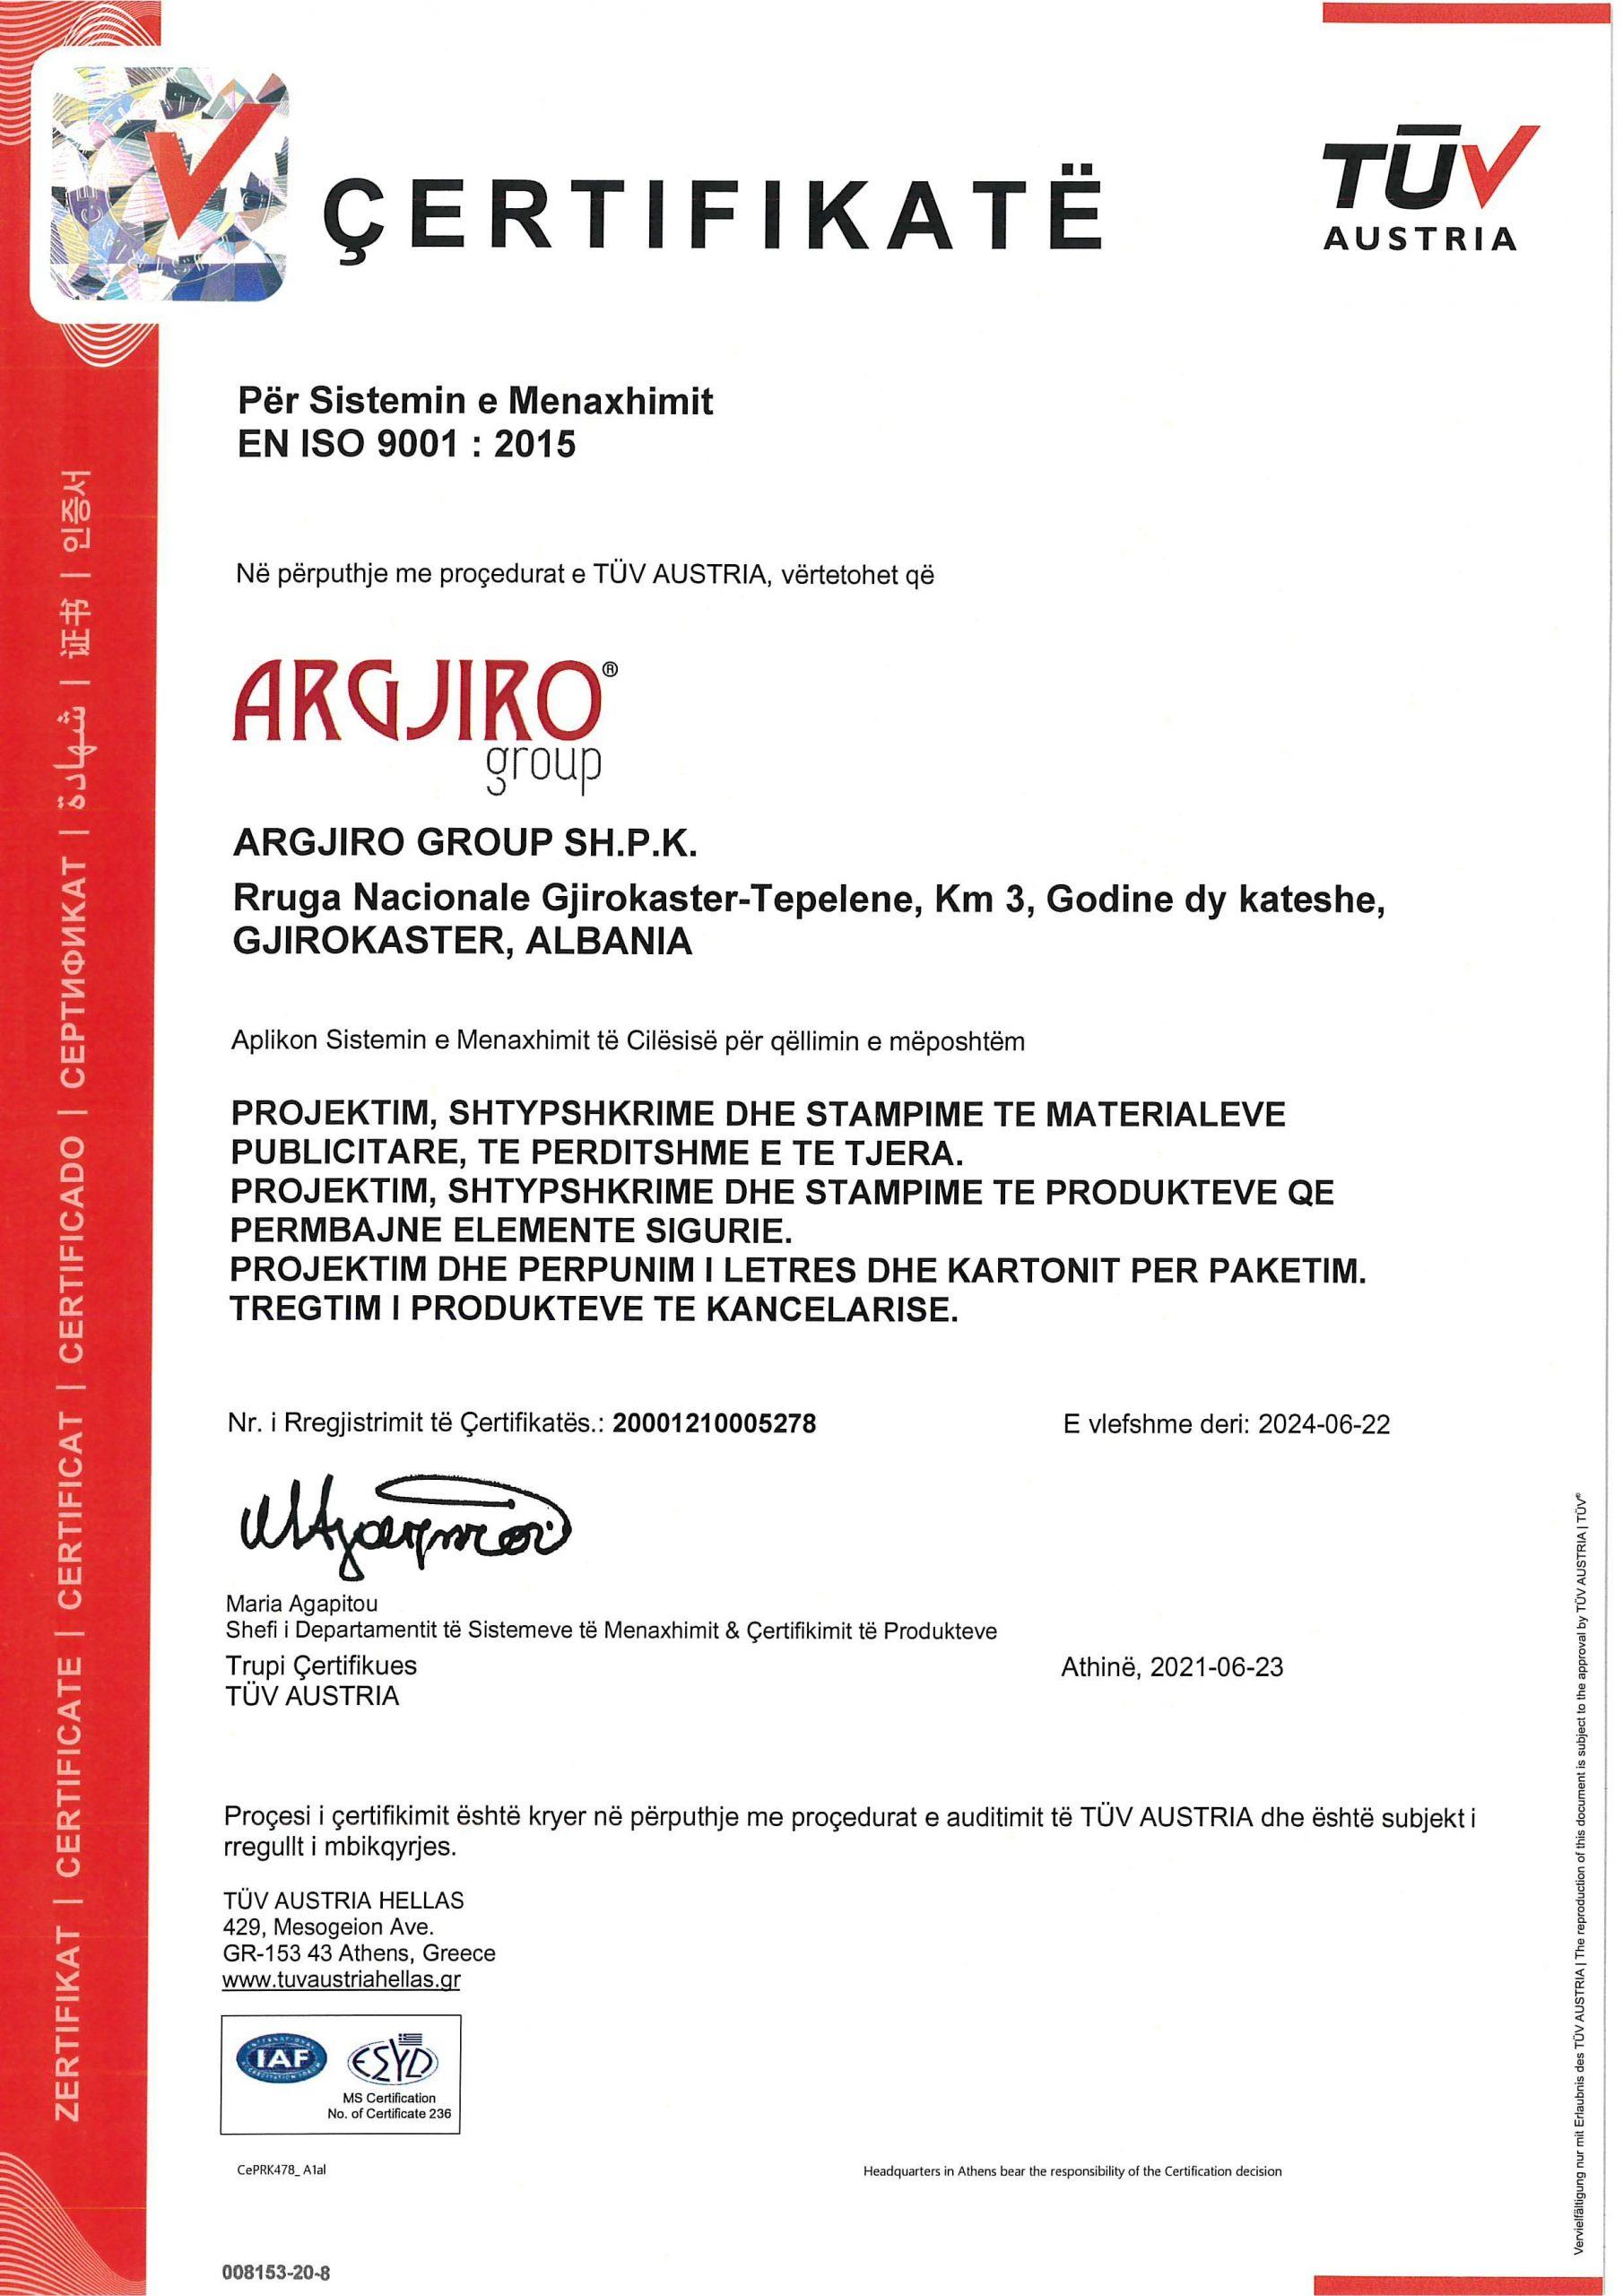 Argjiro GROUP- Certifikata TUV EN ISO 9001 AL